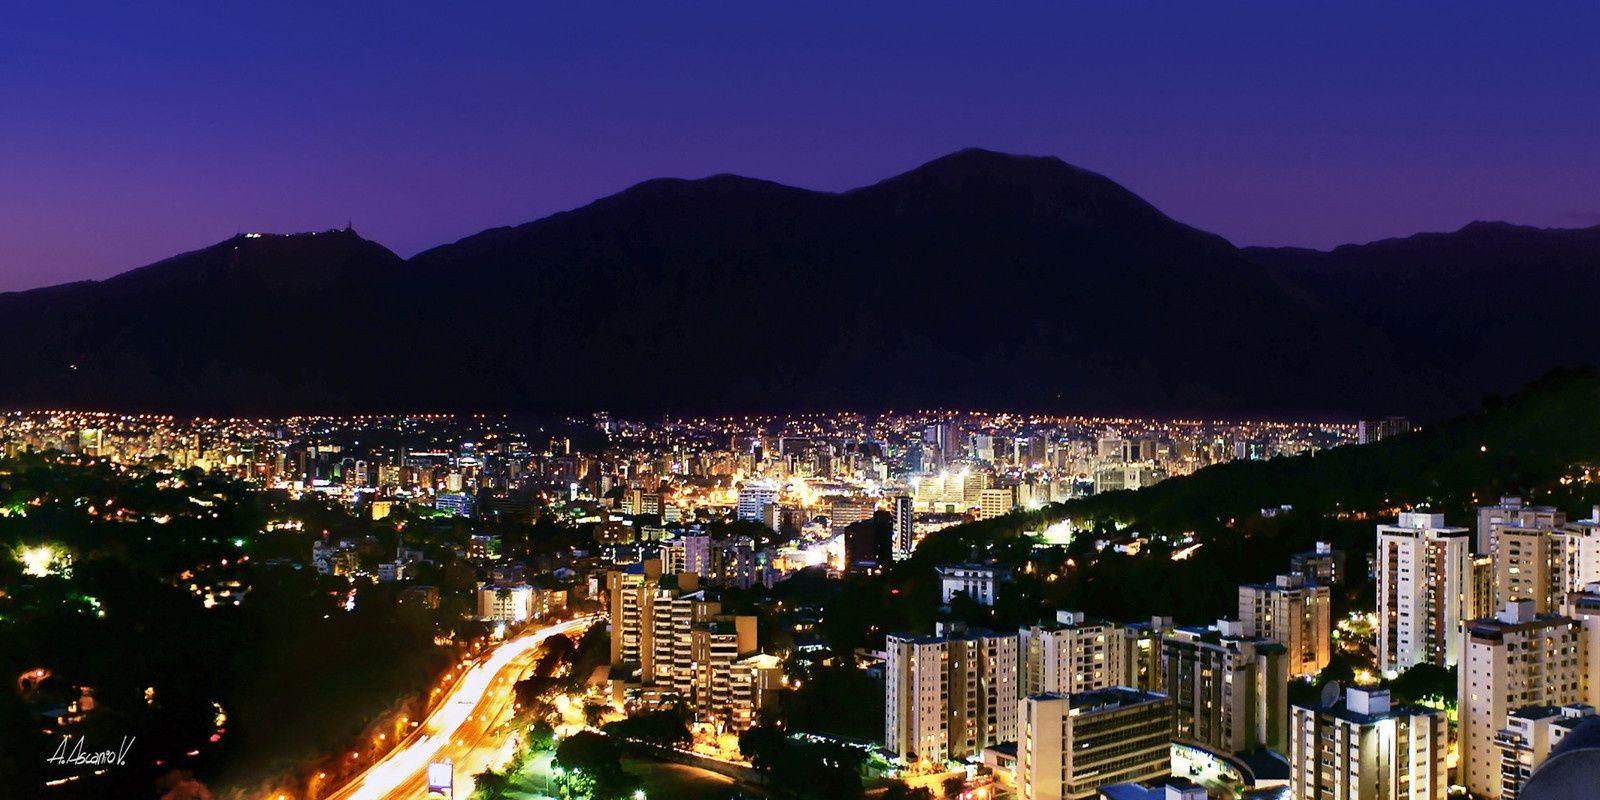 Caracas de nuit avec la silhouette de l'Avila en fond